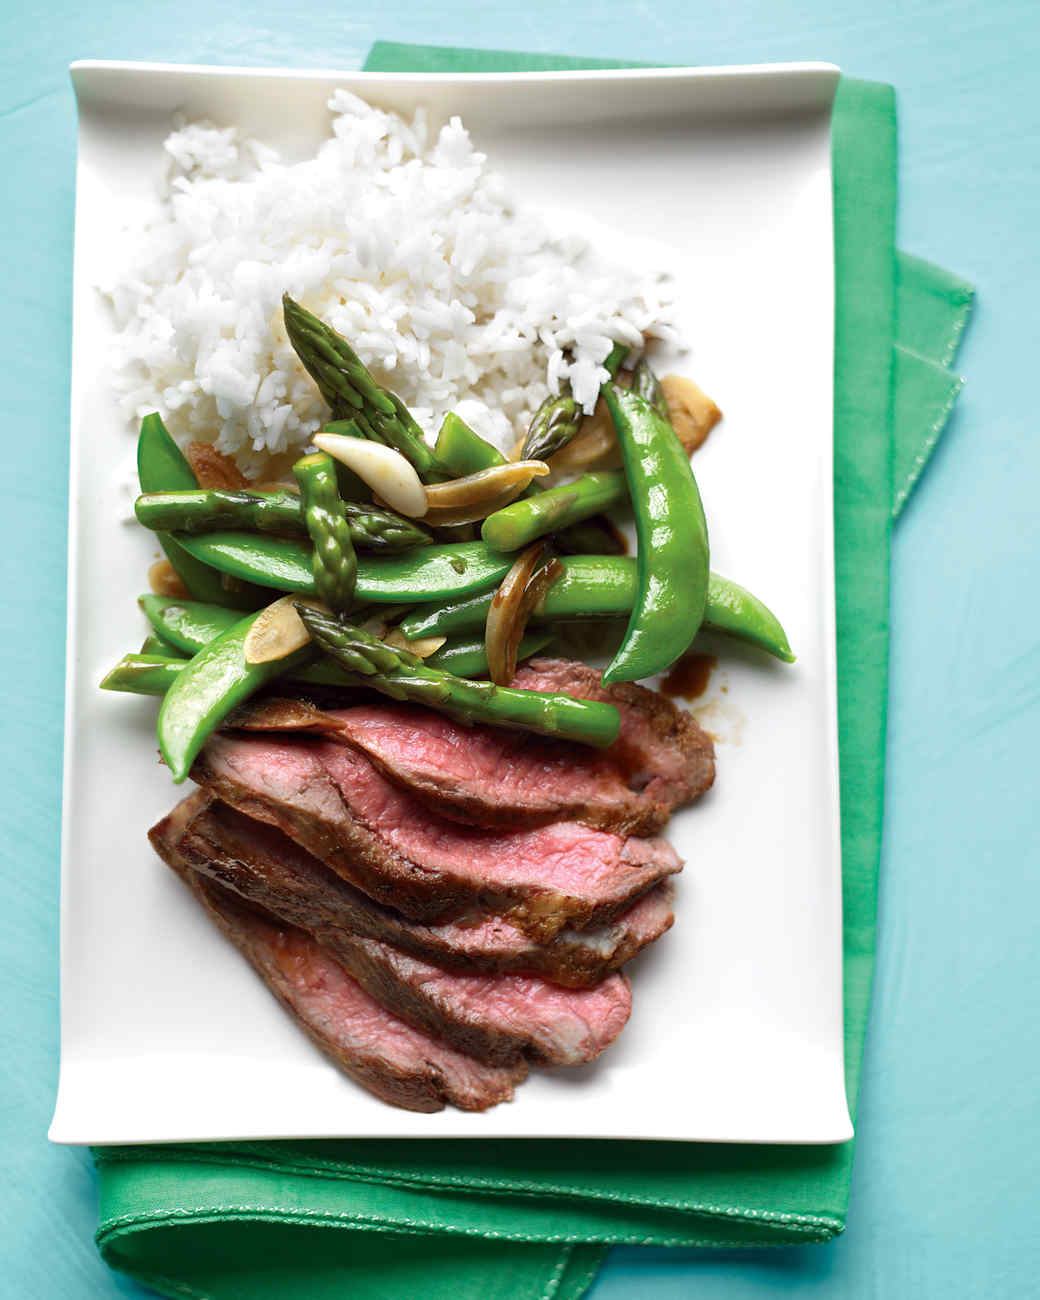 Flank Steak with Snap-Pea and Asparagus Stir-Fry